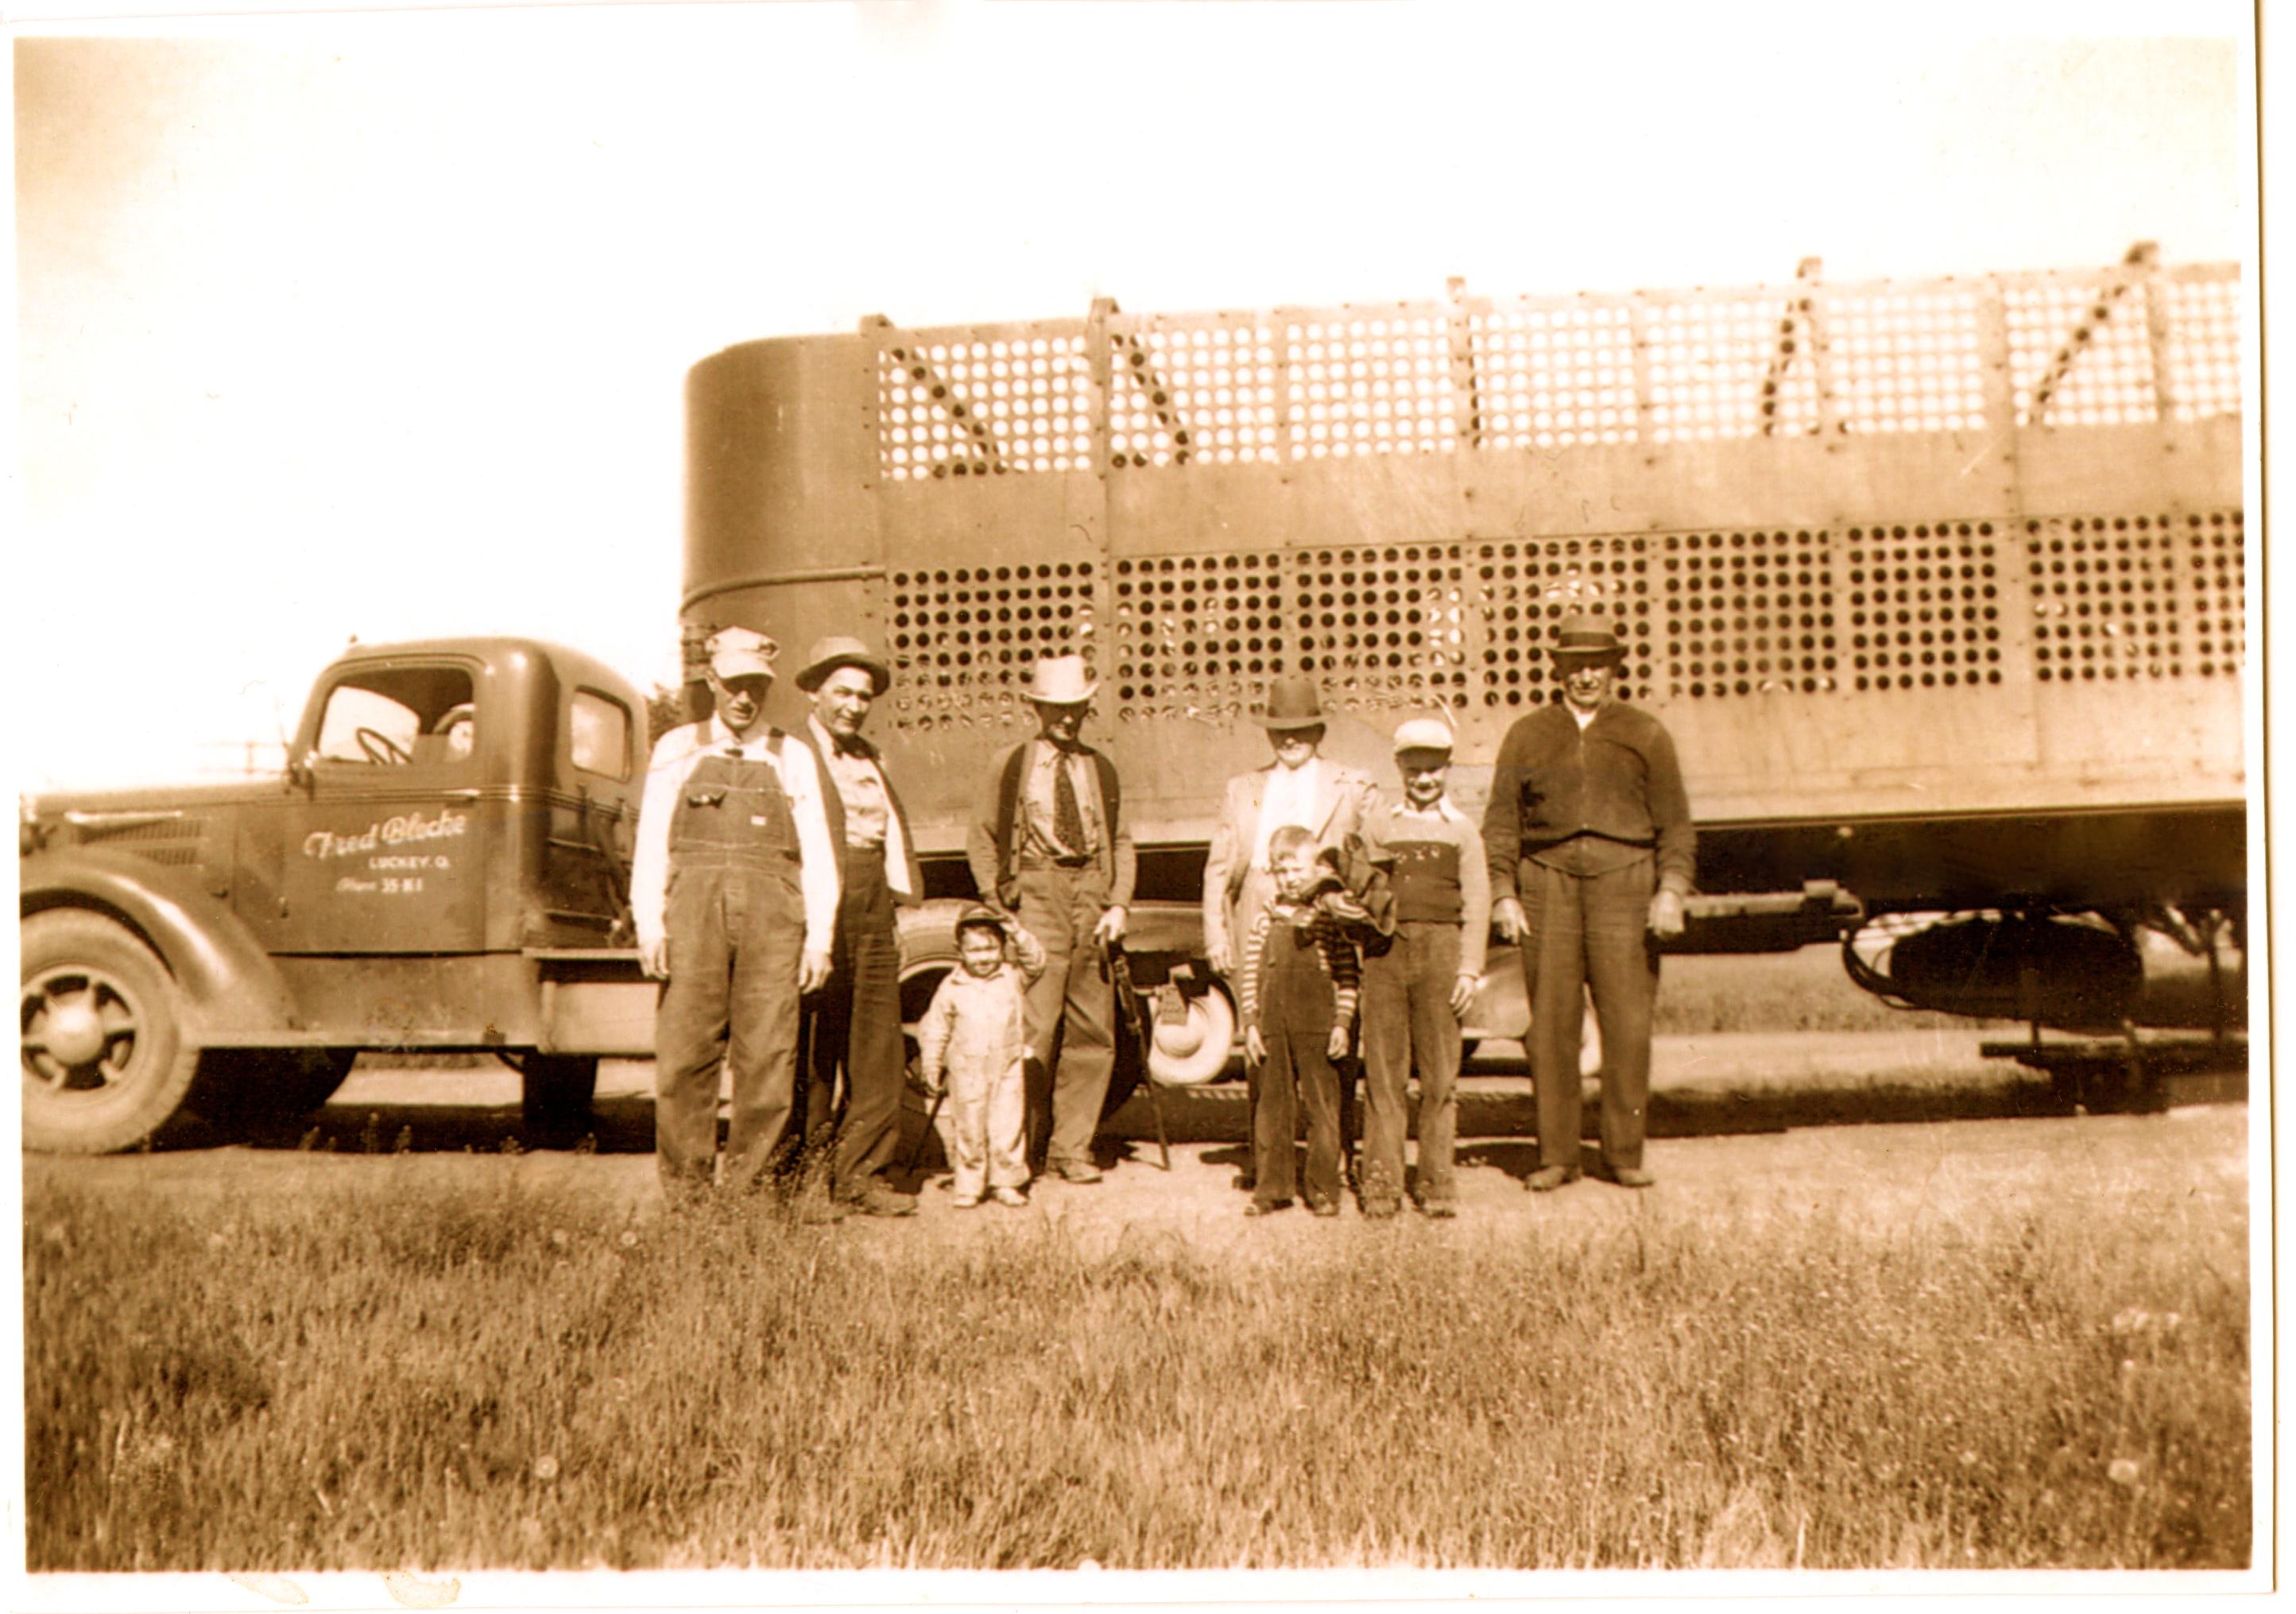 L to R: Earnest Fahle, Fred Blecke (truck owner), Charlotte Fahle, Elmer Shute, Harm H. Fahle, Dale Fahle, Lloyd Fahle, Henry H. Fahle